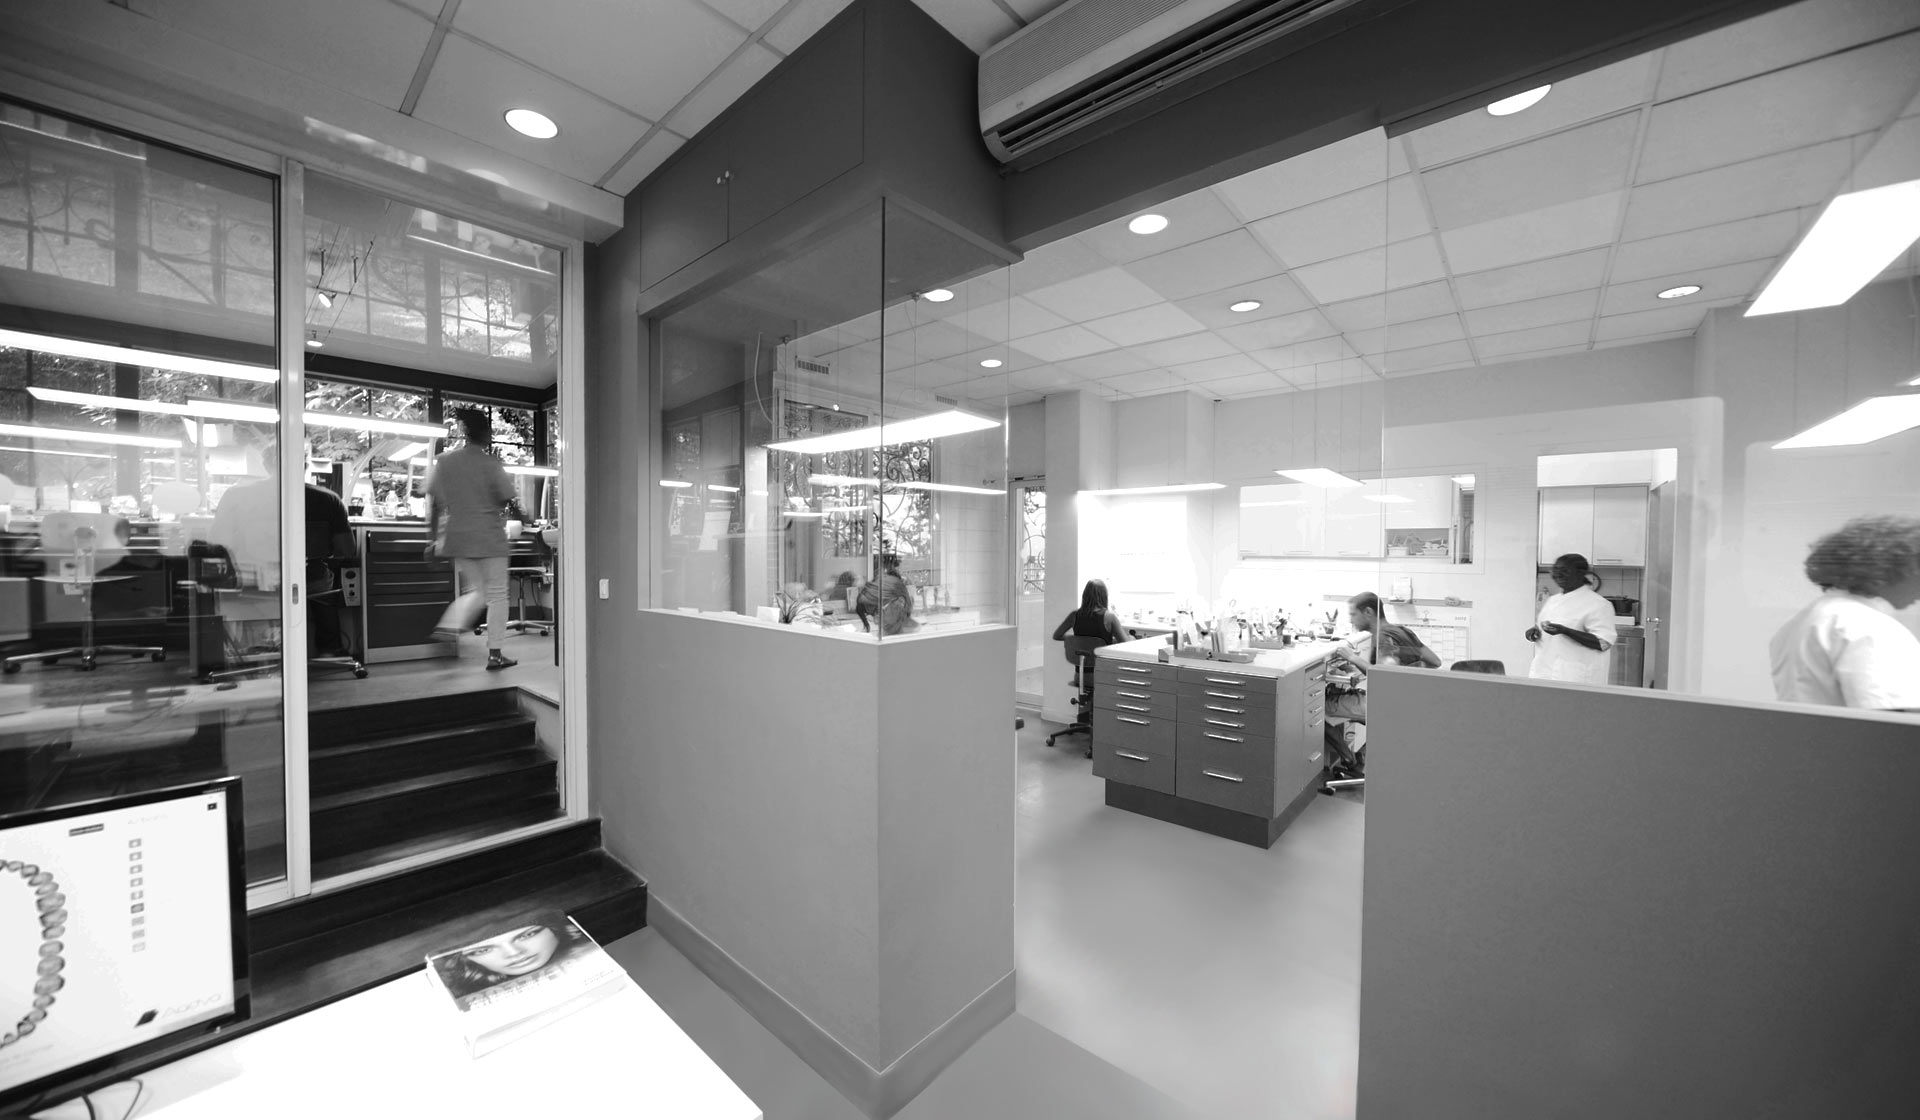 ARCADE Laboratory